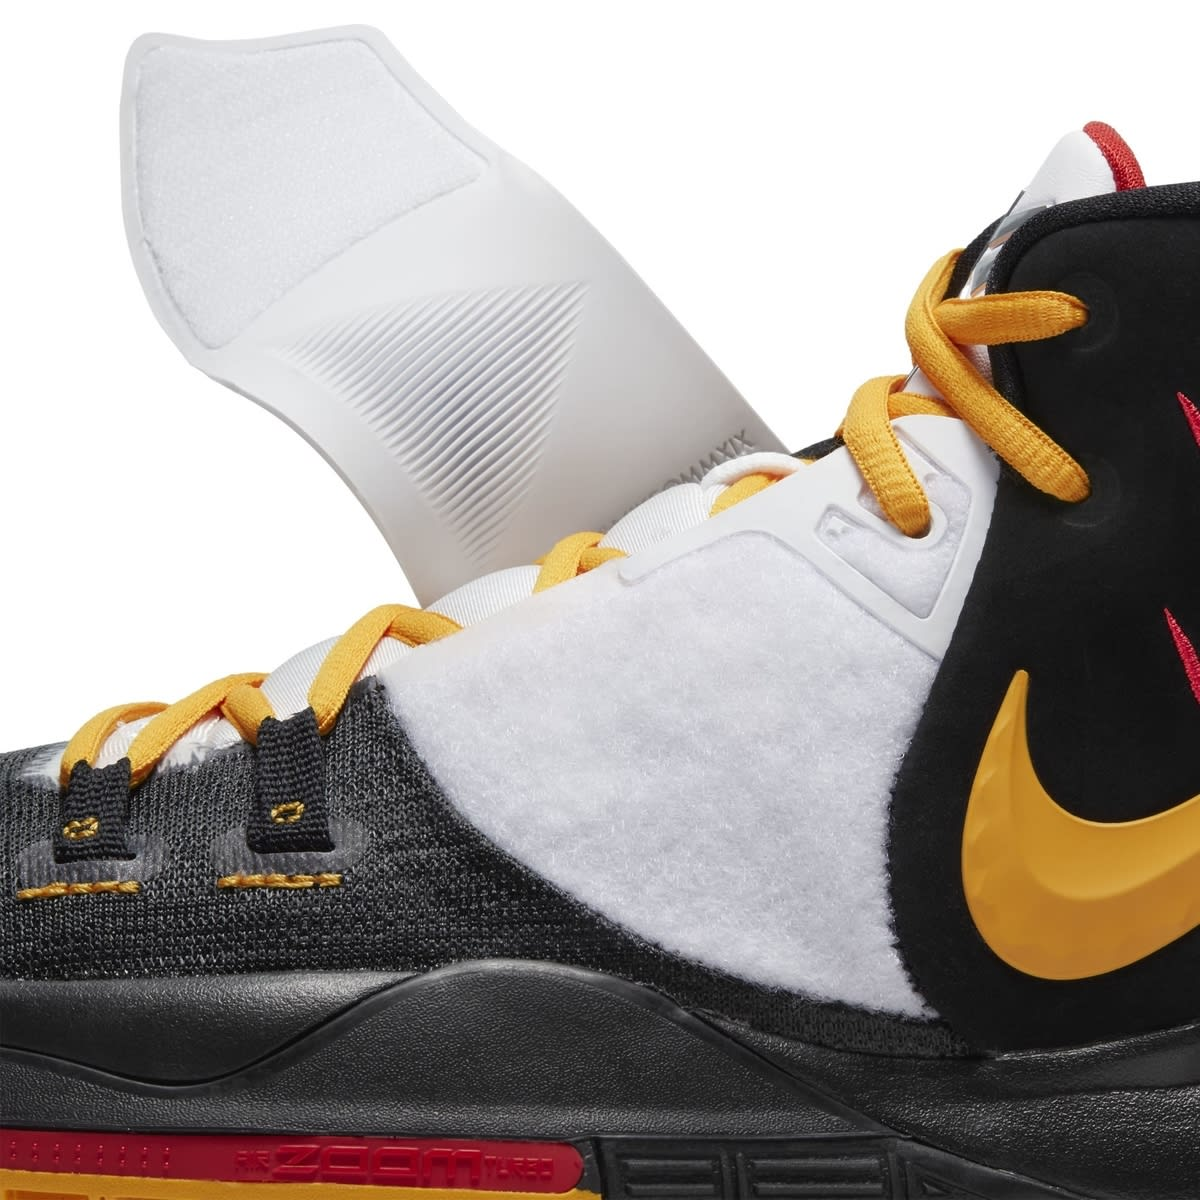 Nike Kyrie 6 Black Bruce Lee Mamba Release Date Strap